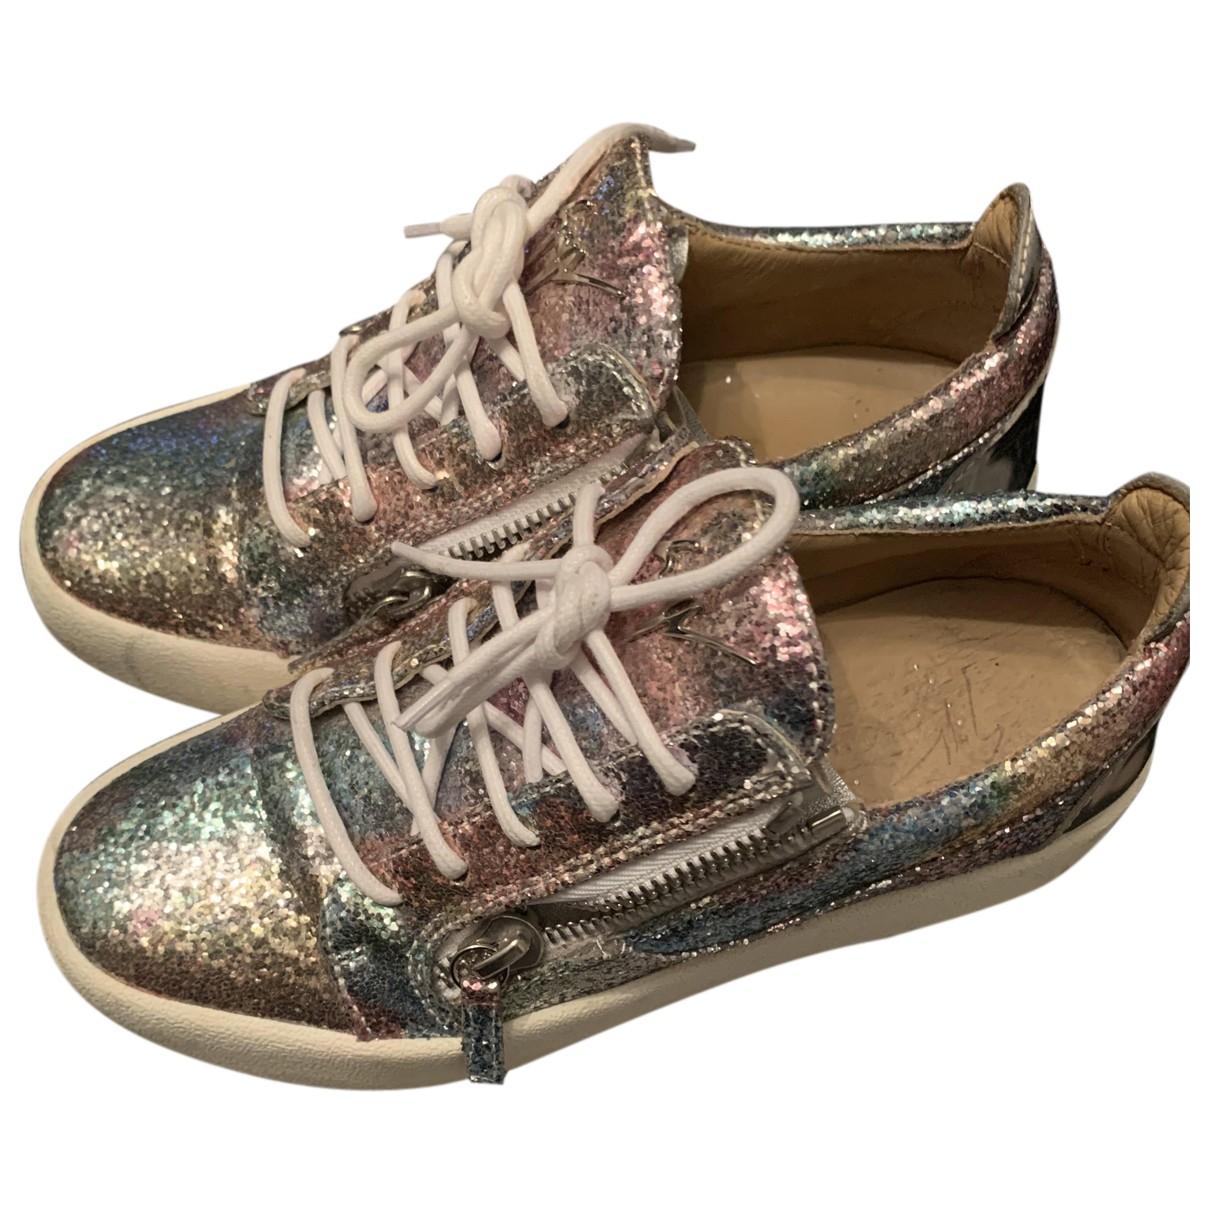 Giuseppe Zanotti Nicki Multicolour Glitter Trainers for Women 39 EU